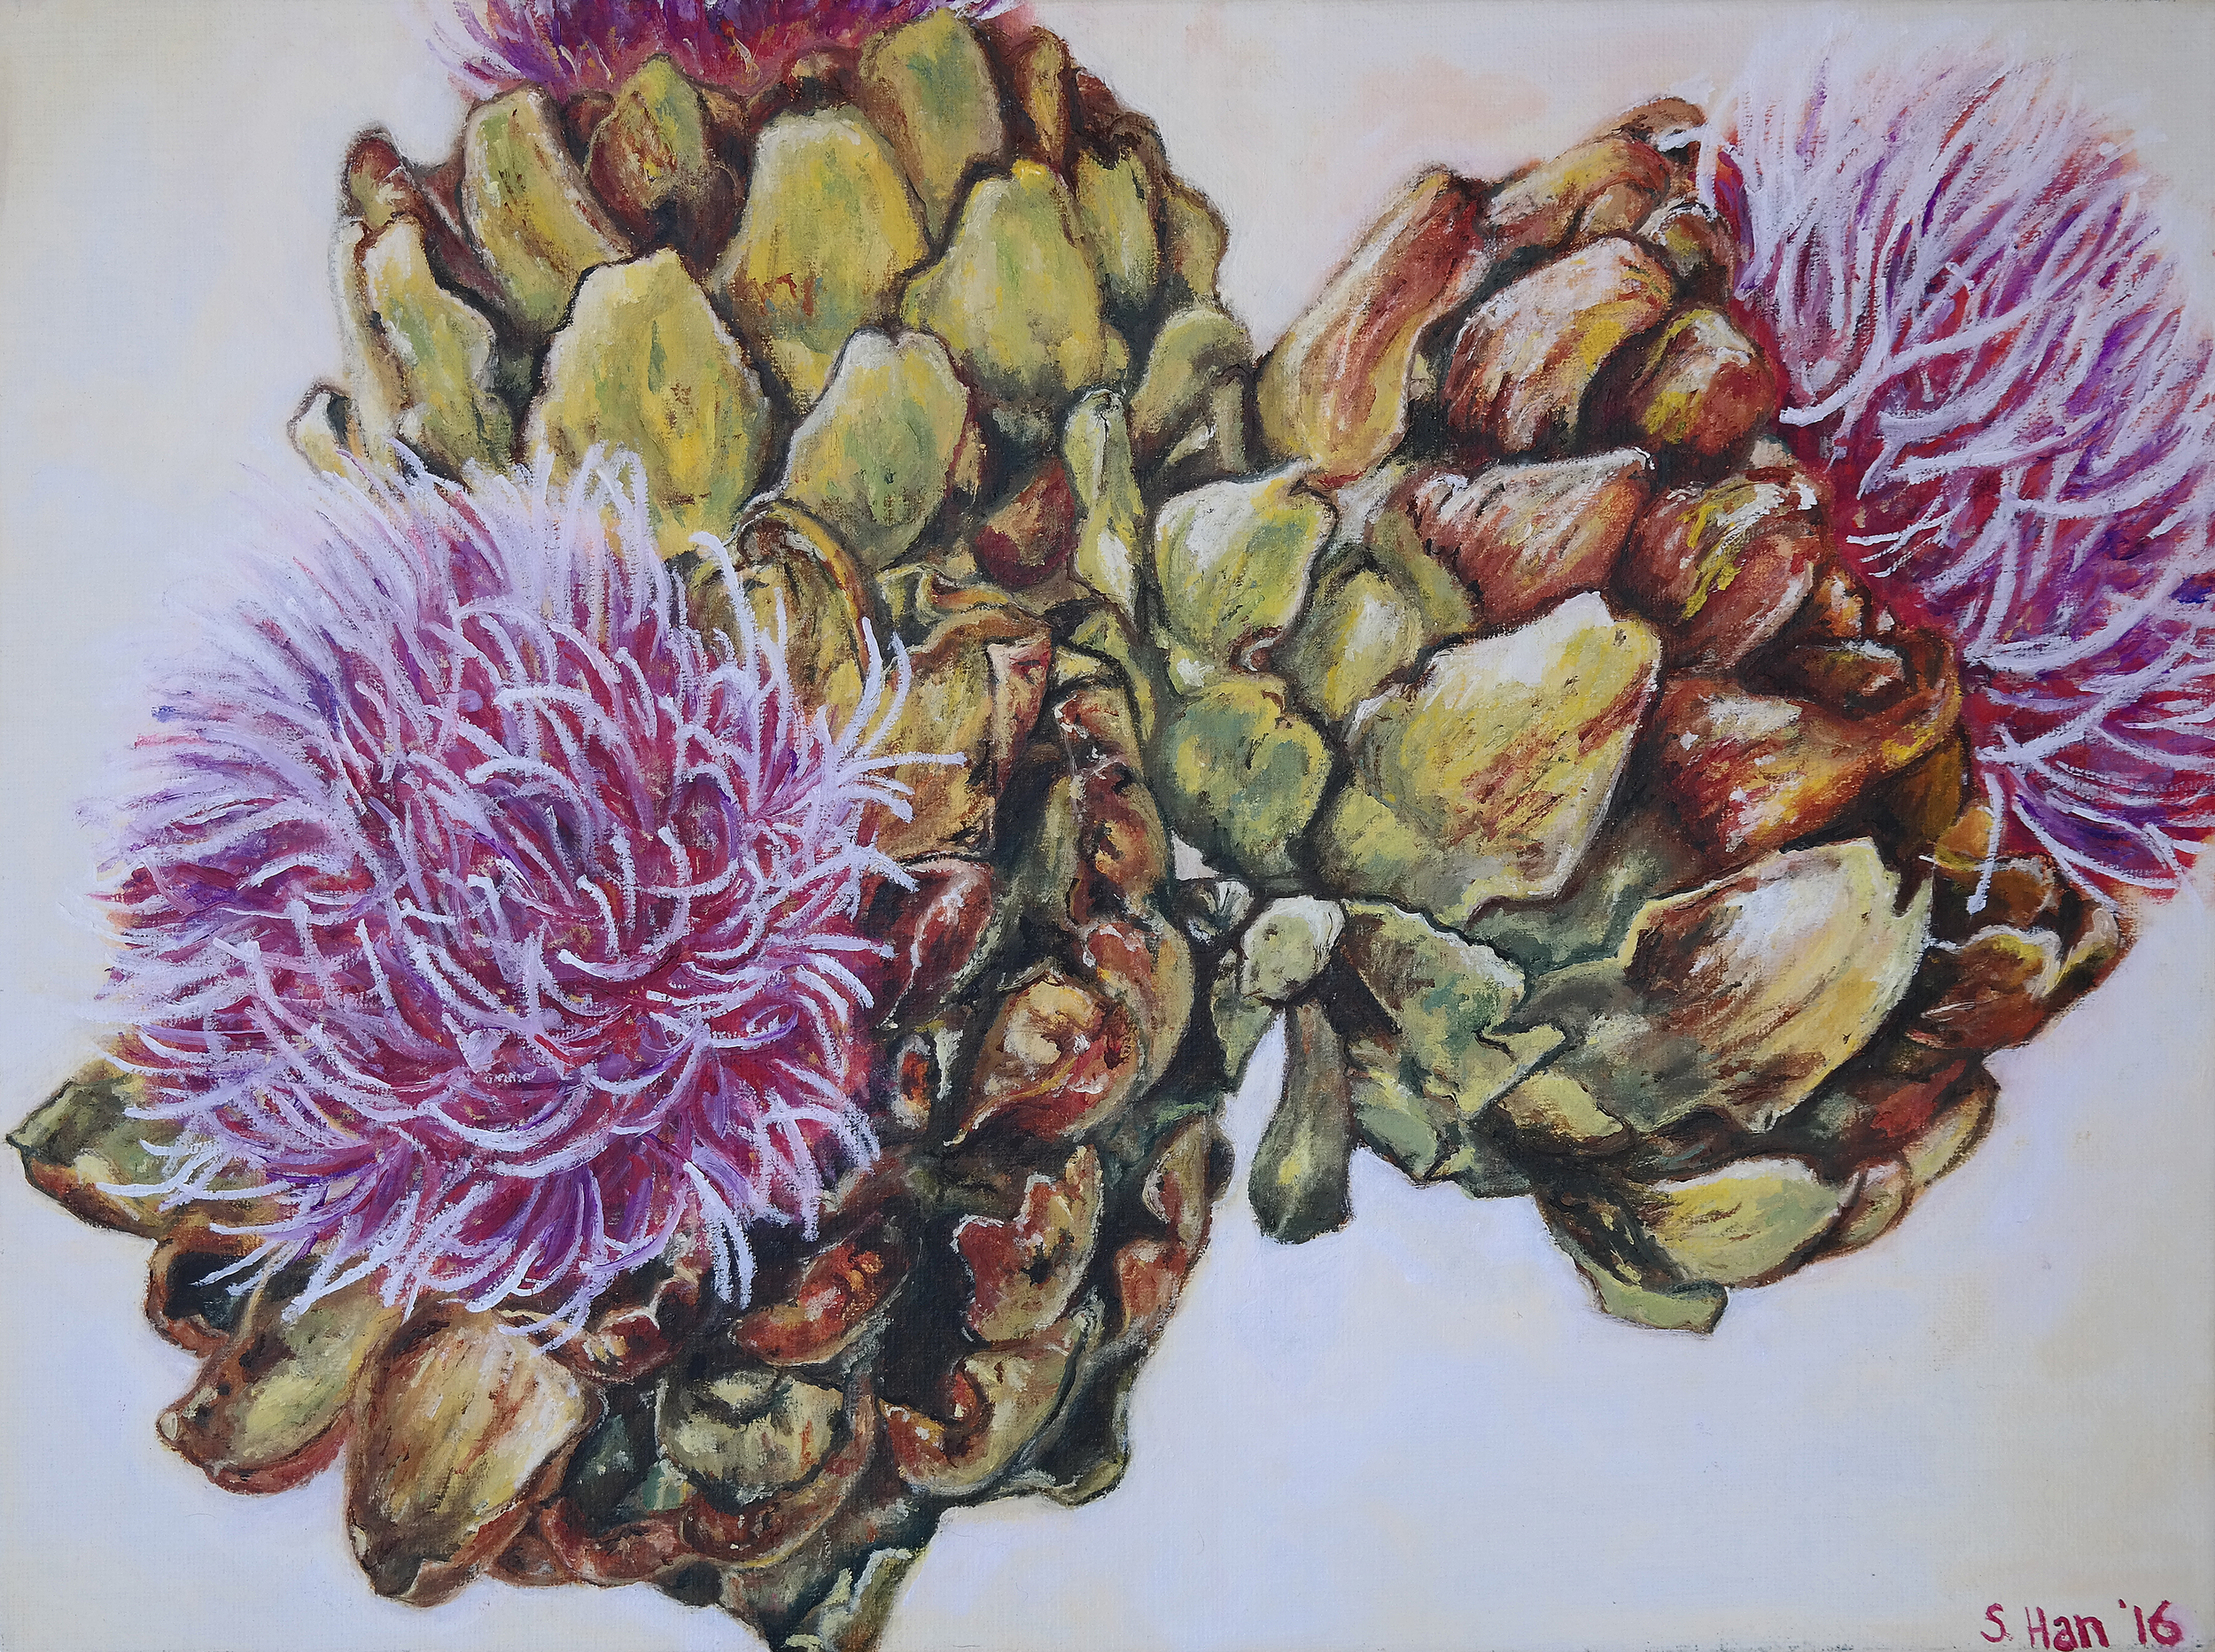 Flowering artichokes